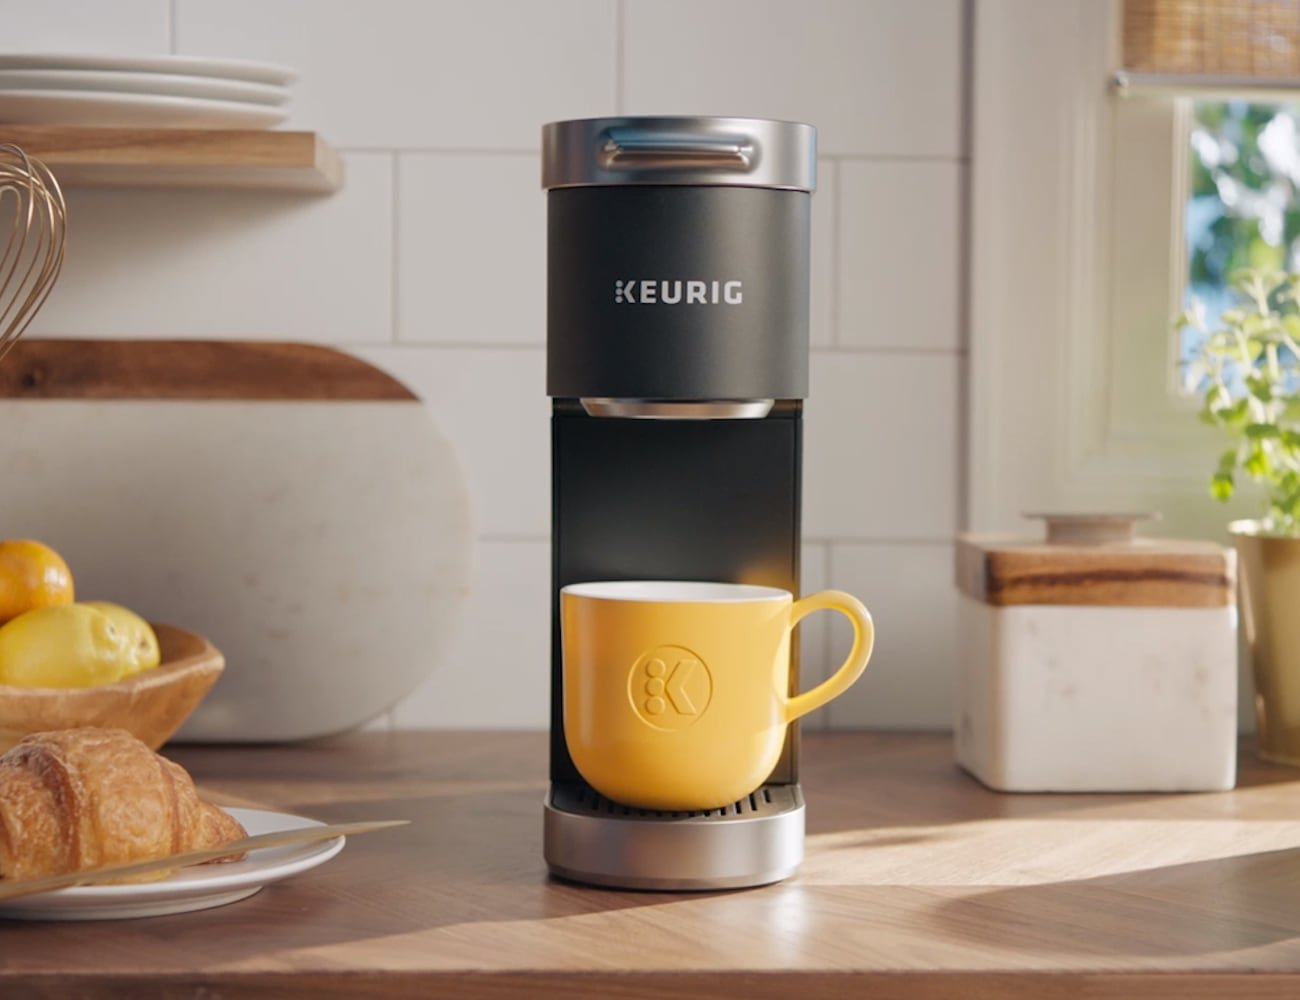 Keurig K-Mini Plus portable coffee maker lets you enjoy truly great coffee anywhere